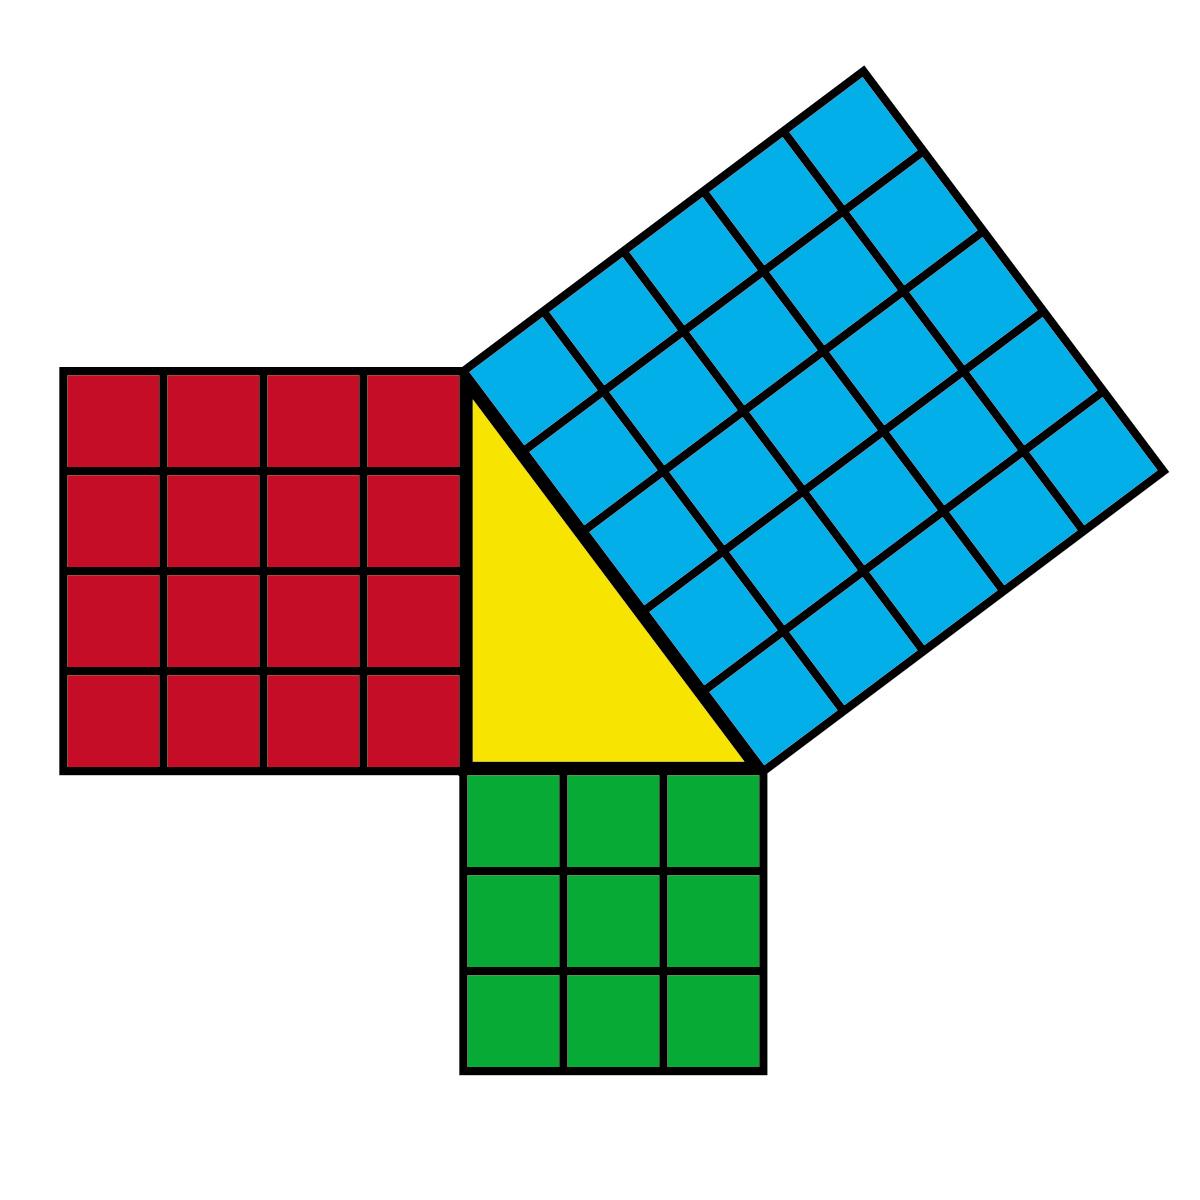 Geometry Angle Free Clipart #1-Geometry Angle Free Clipart #1-11